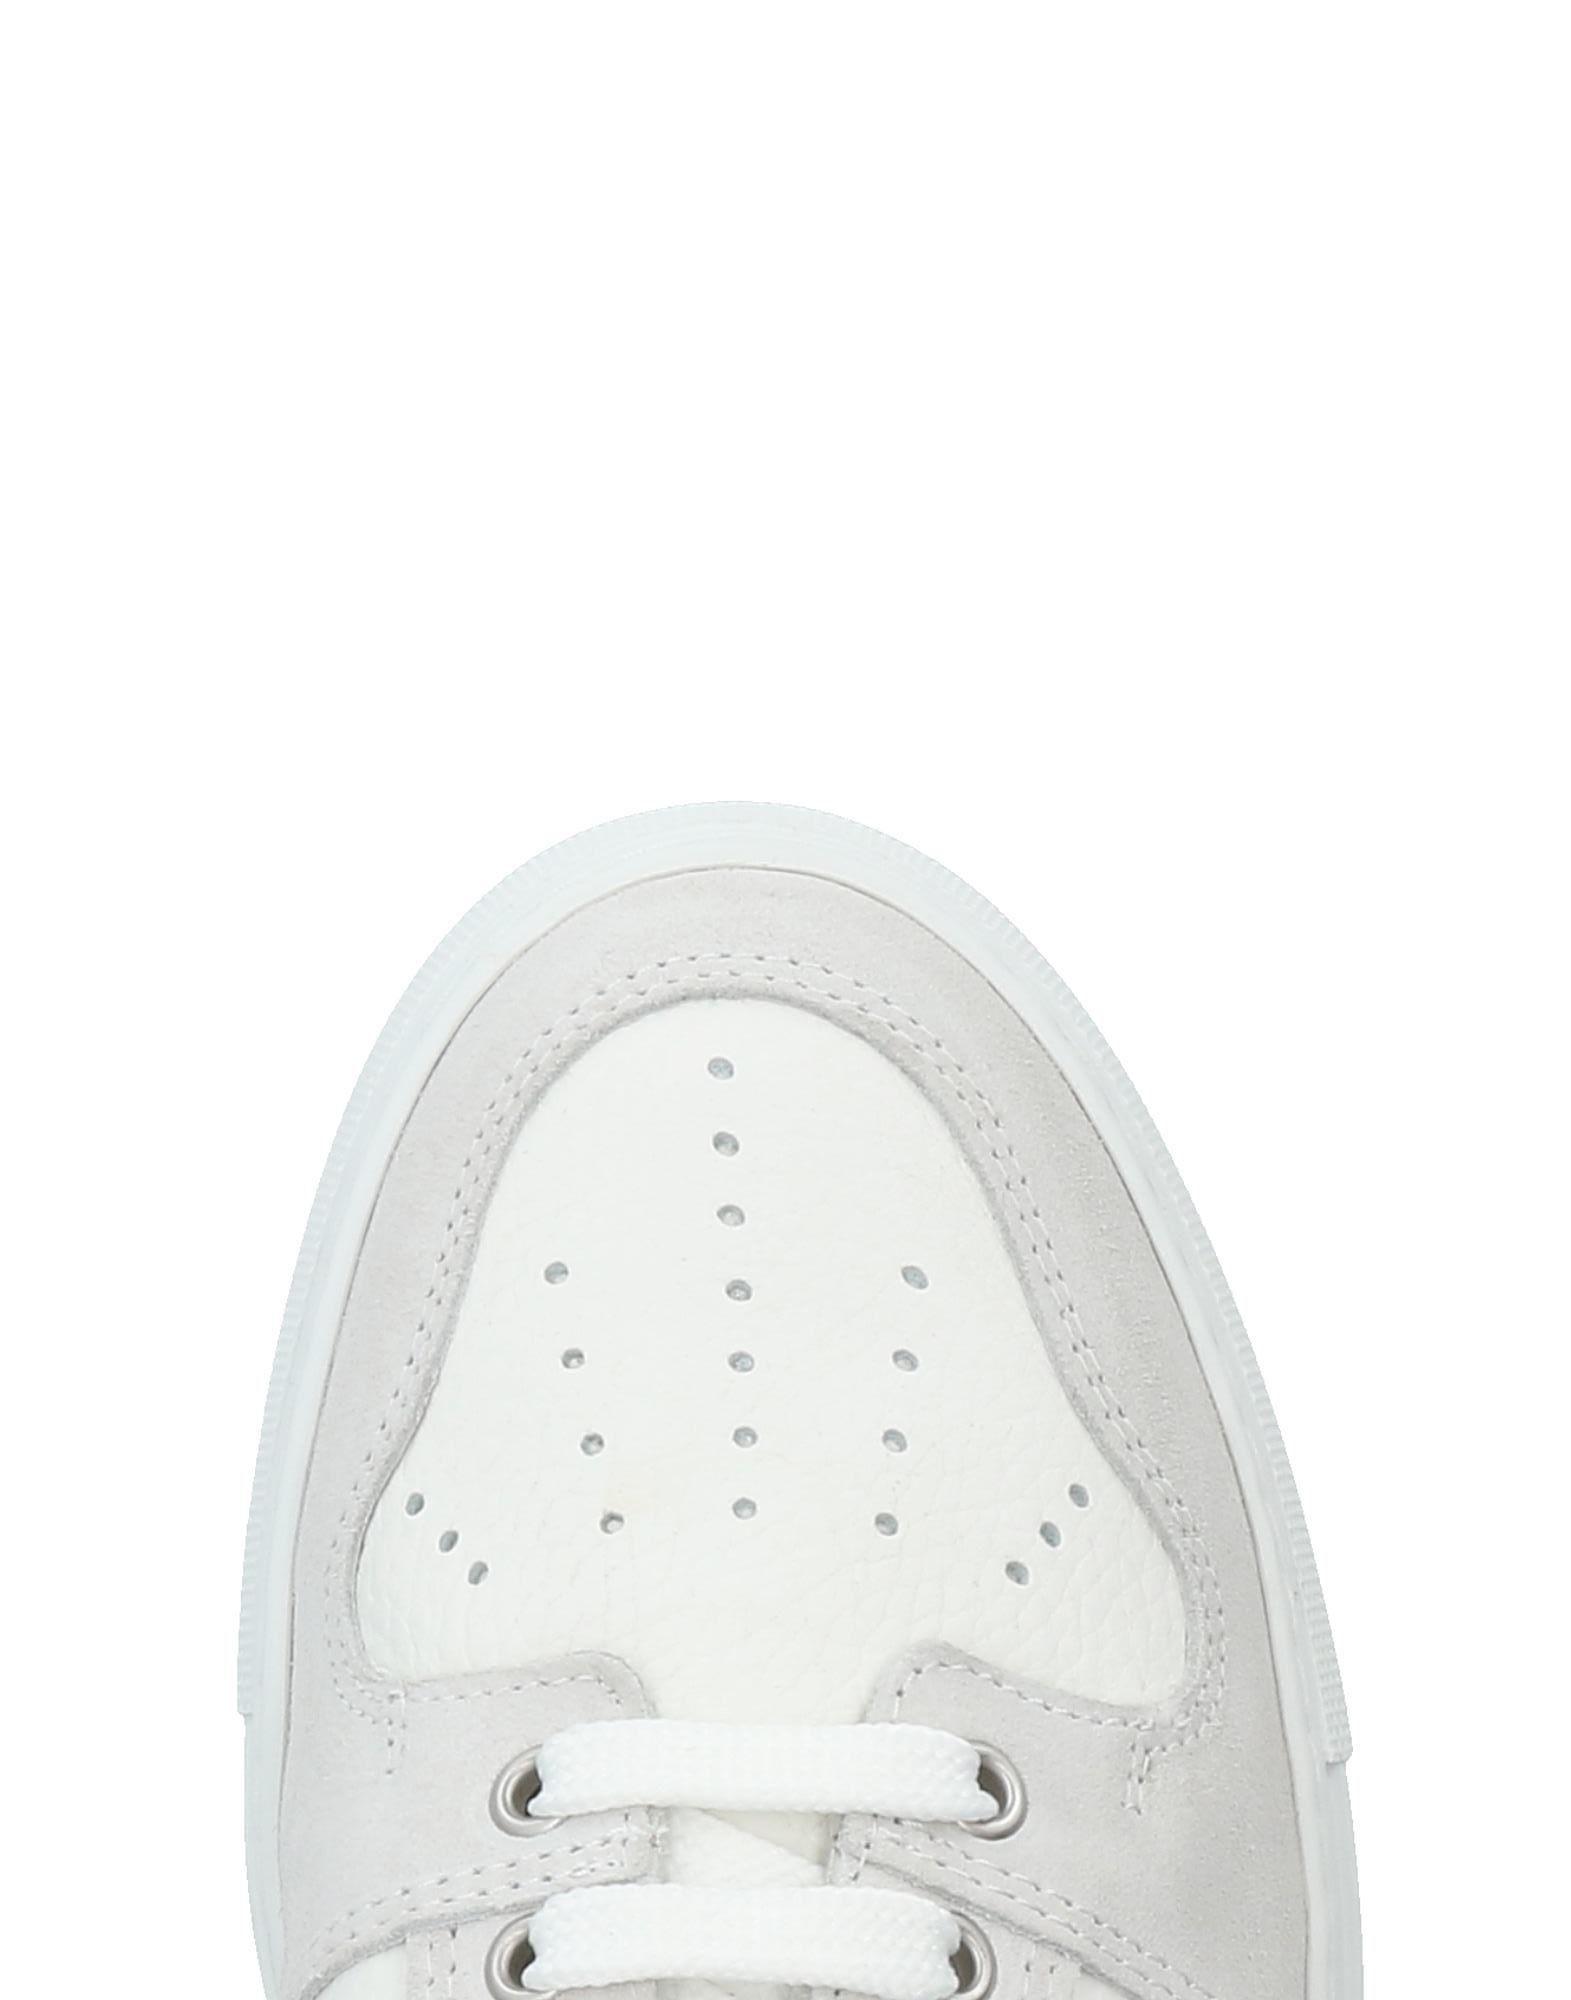 Sneakers Ami Alexandre Mattiussi Homme - Sneakers Ami Alexandre Mattiussi sur